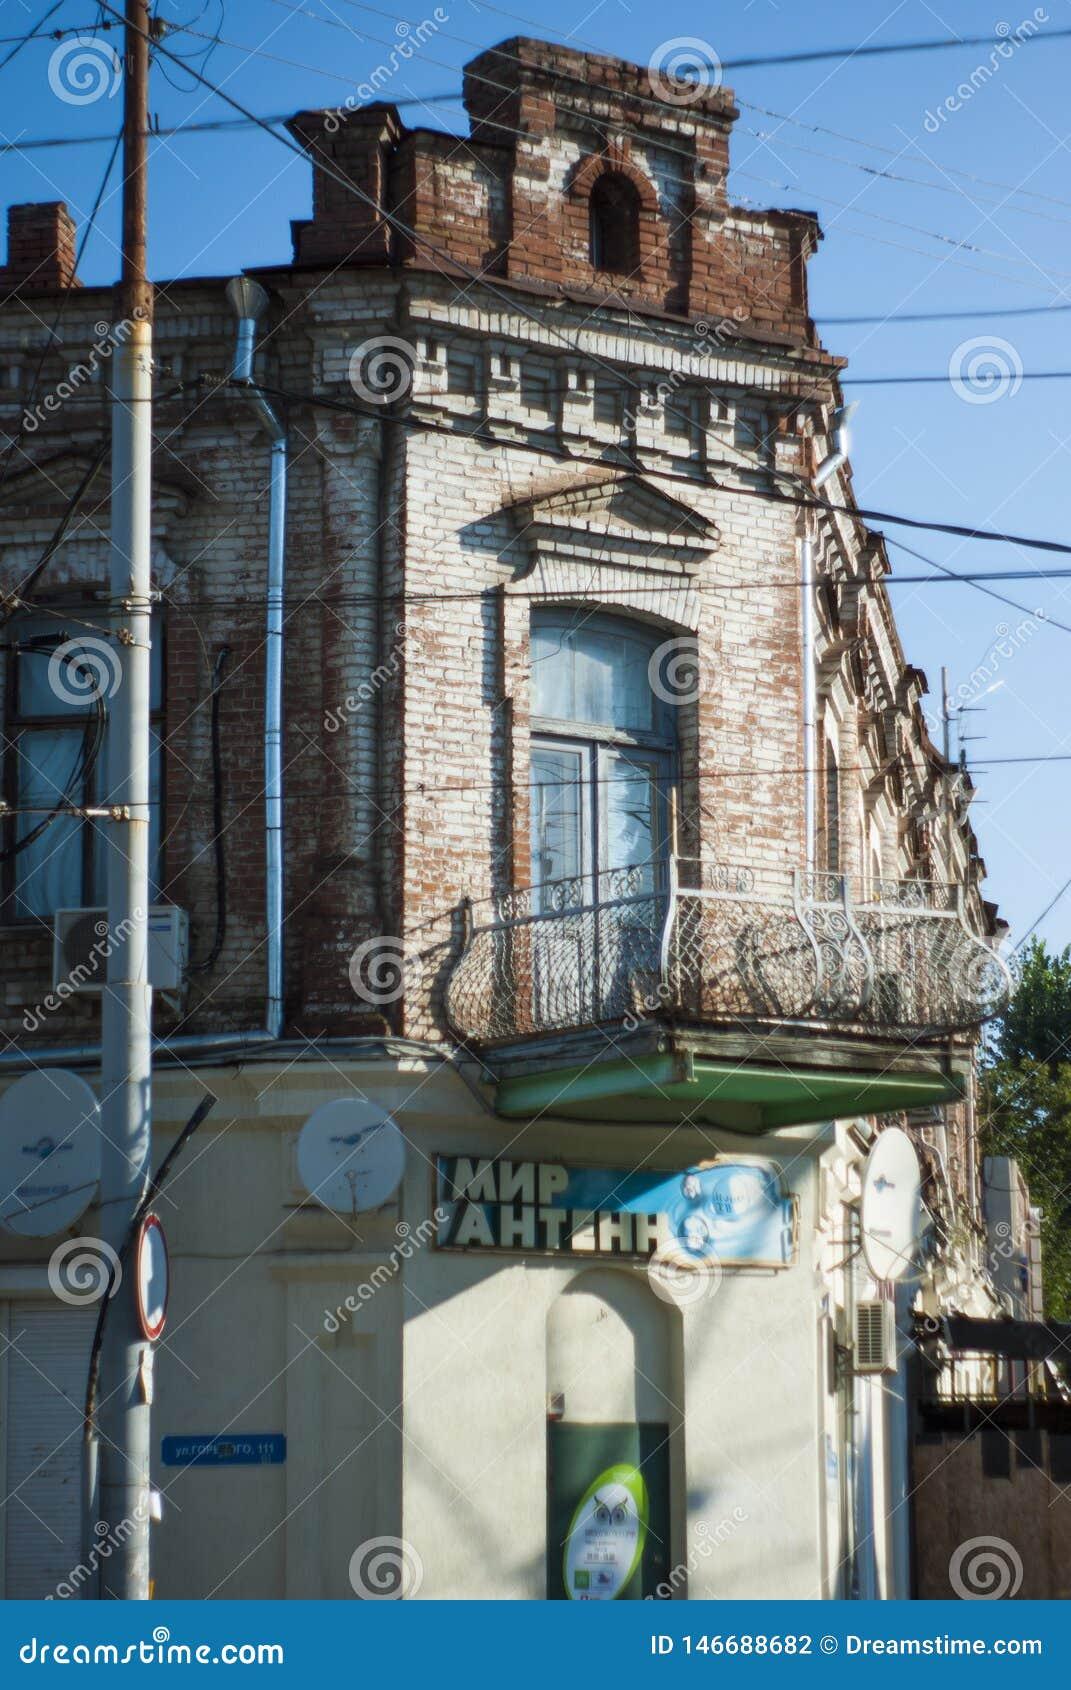 Russia Krasnodar Photos Of The City Center Editorial Photography Image Of Buildings Center 146688682